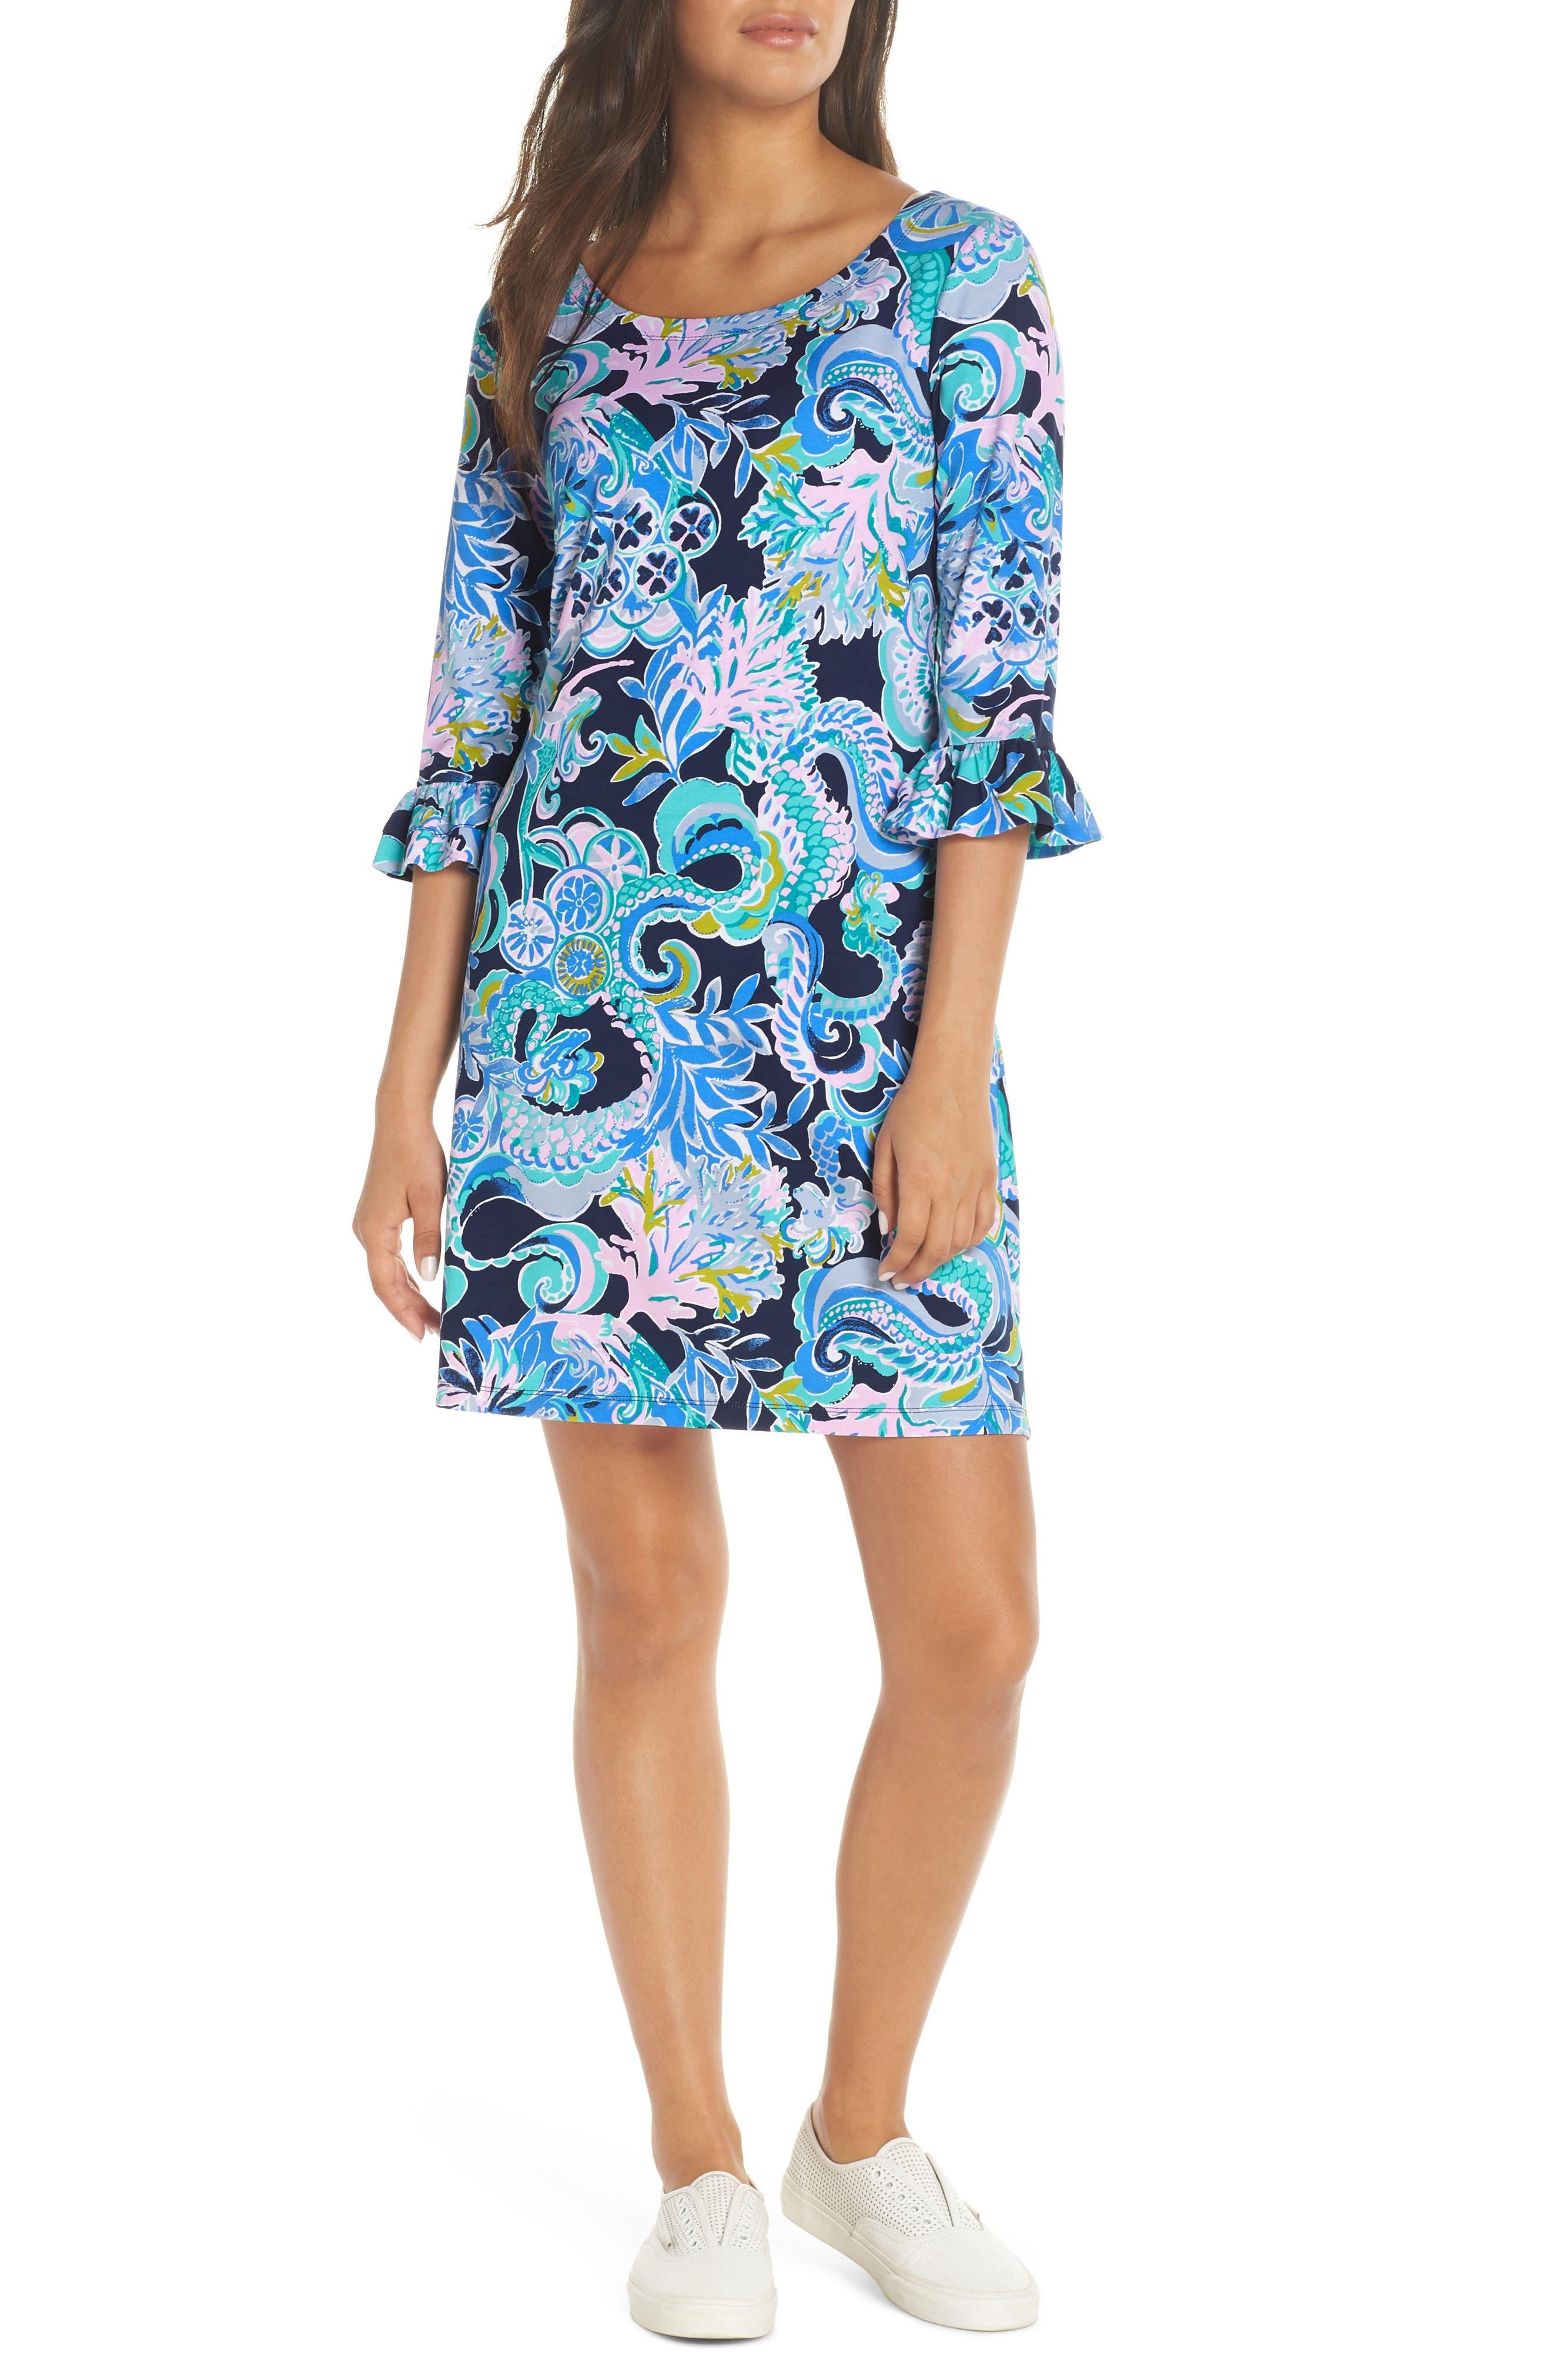 Lilly Pulitzer Sophie Upf 50+ Shift Dress, Blue